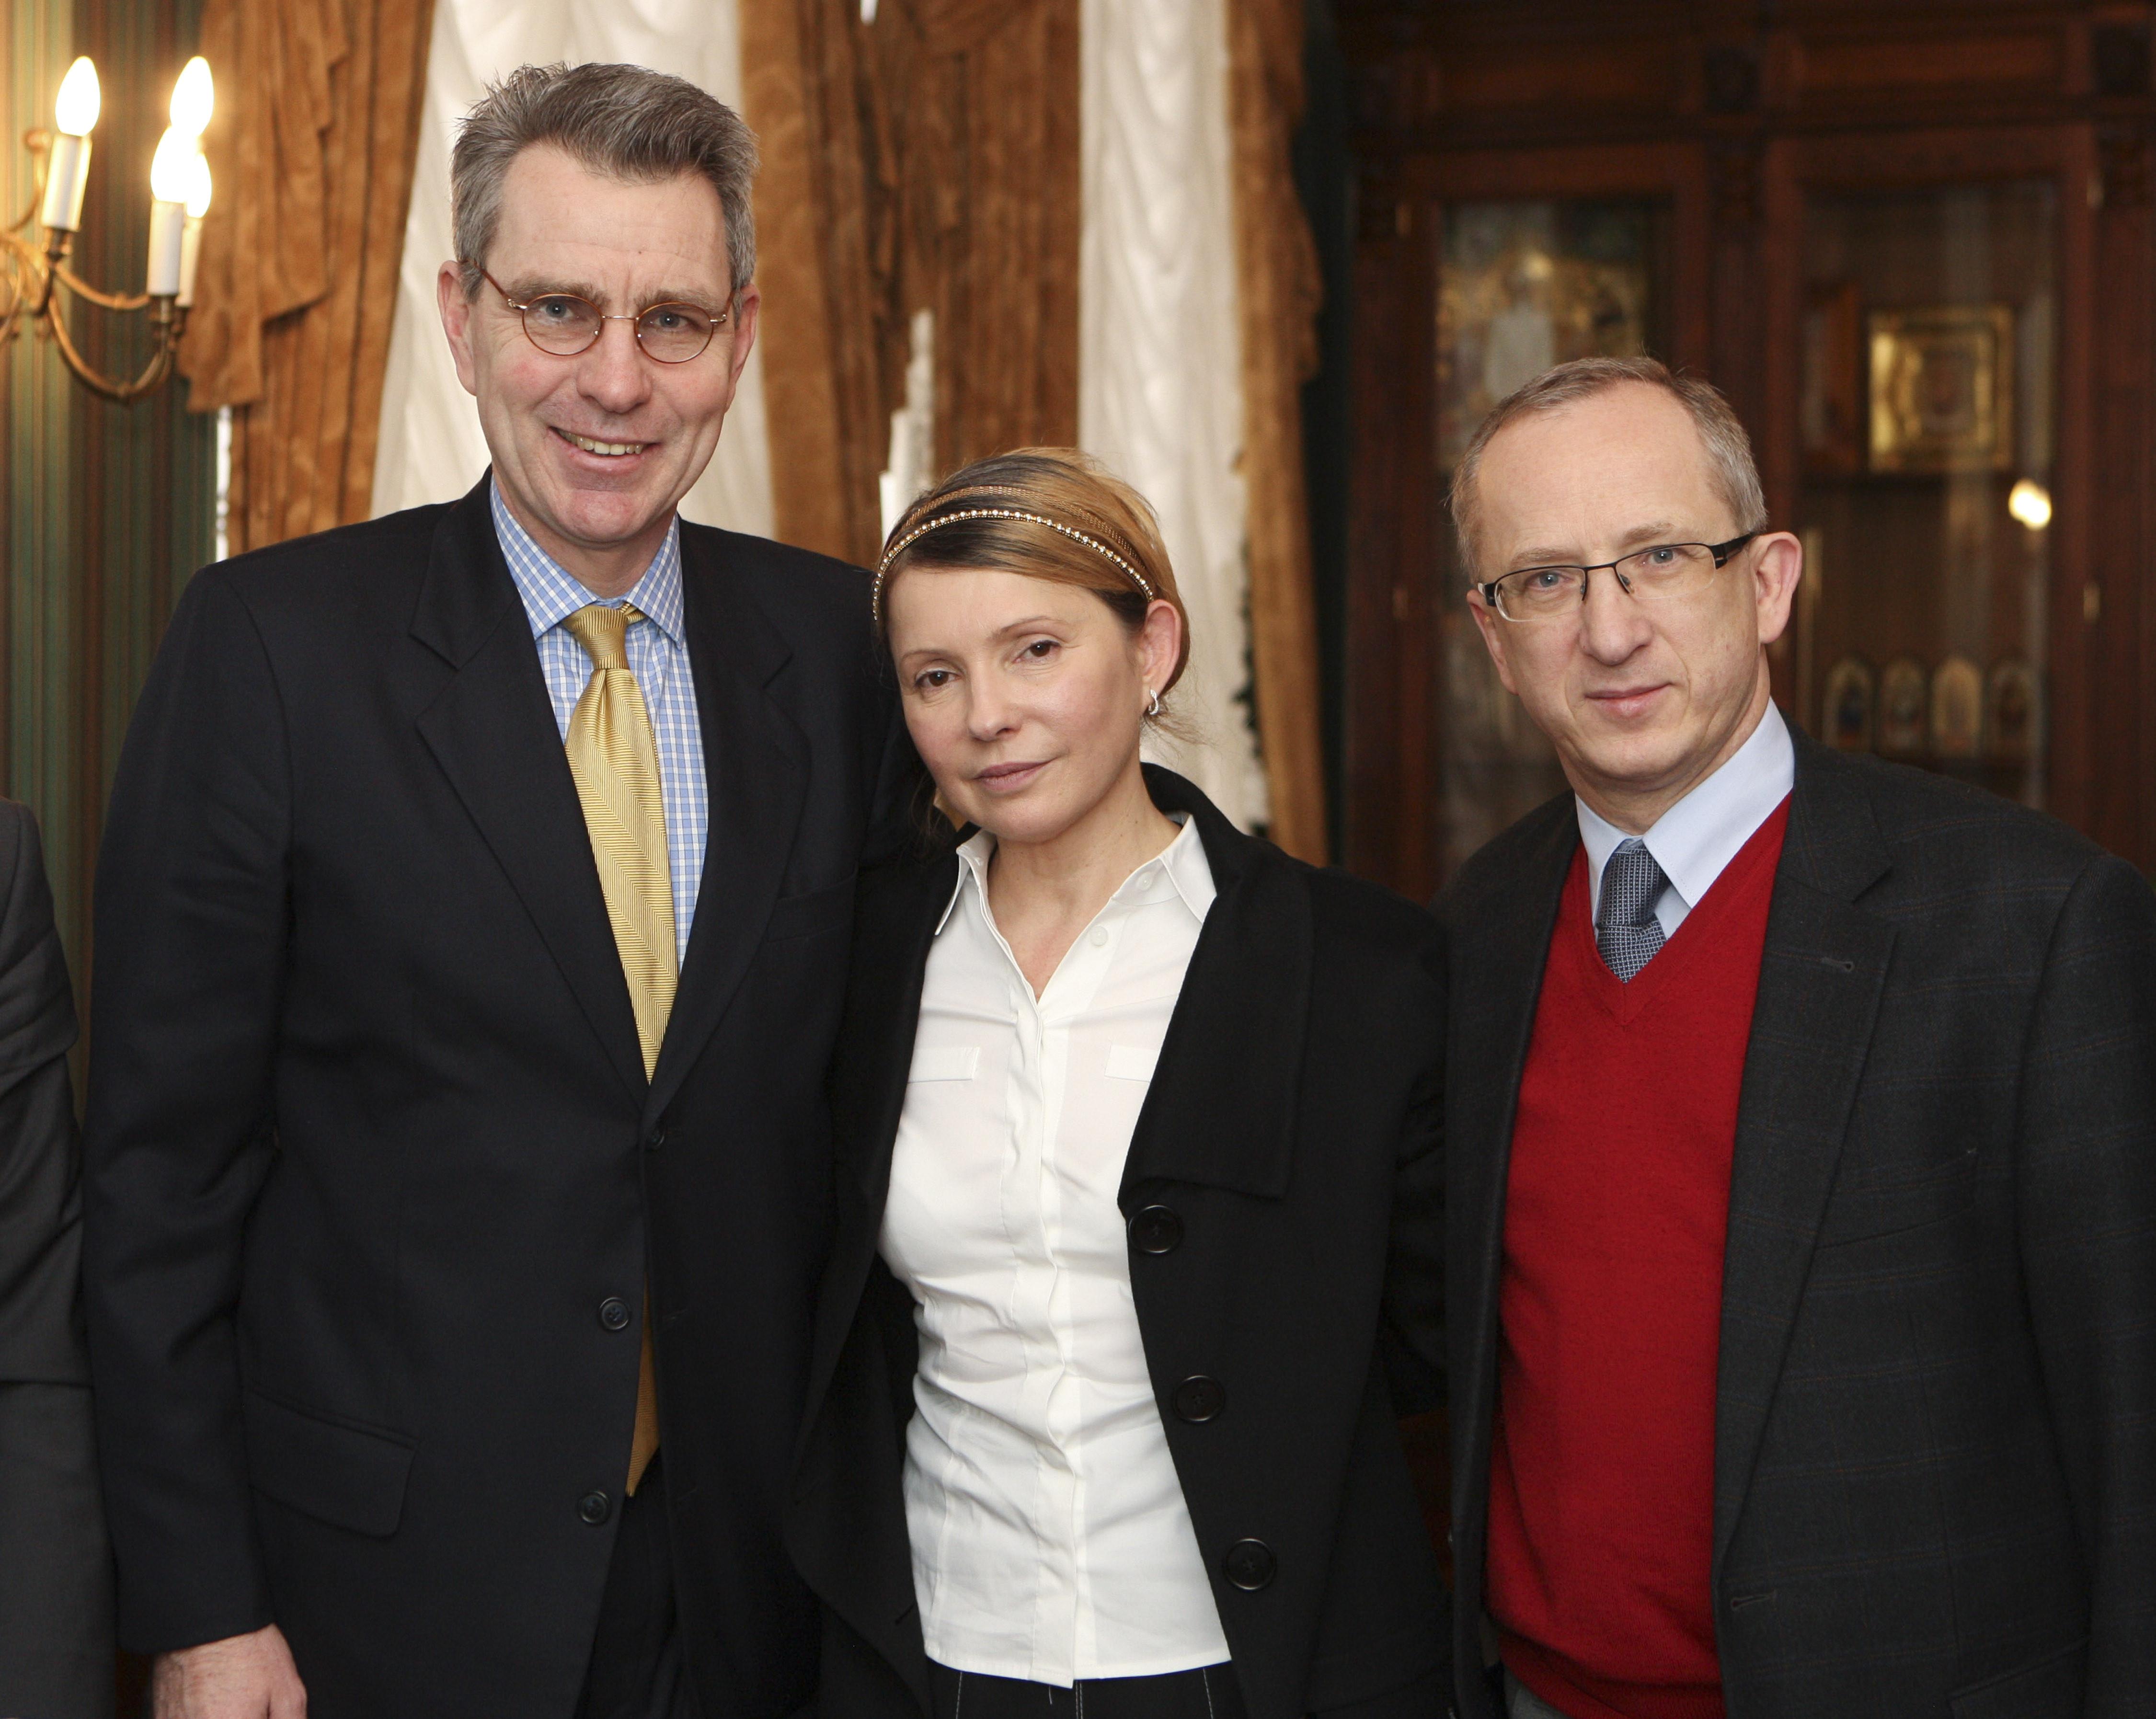 Top Ukrainian opposition figure Yulia Tymoshenko, released from prison Saturday after 930 days of captivity, meets Sunday  with U.S. Ambassador Geoffrey Pyatt, left, and EU Ambassador to Ukraine Jan Tombinski, right, in Kiev, Ukraine.